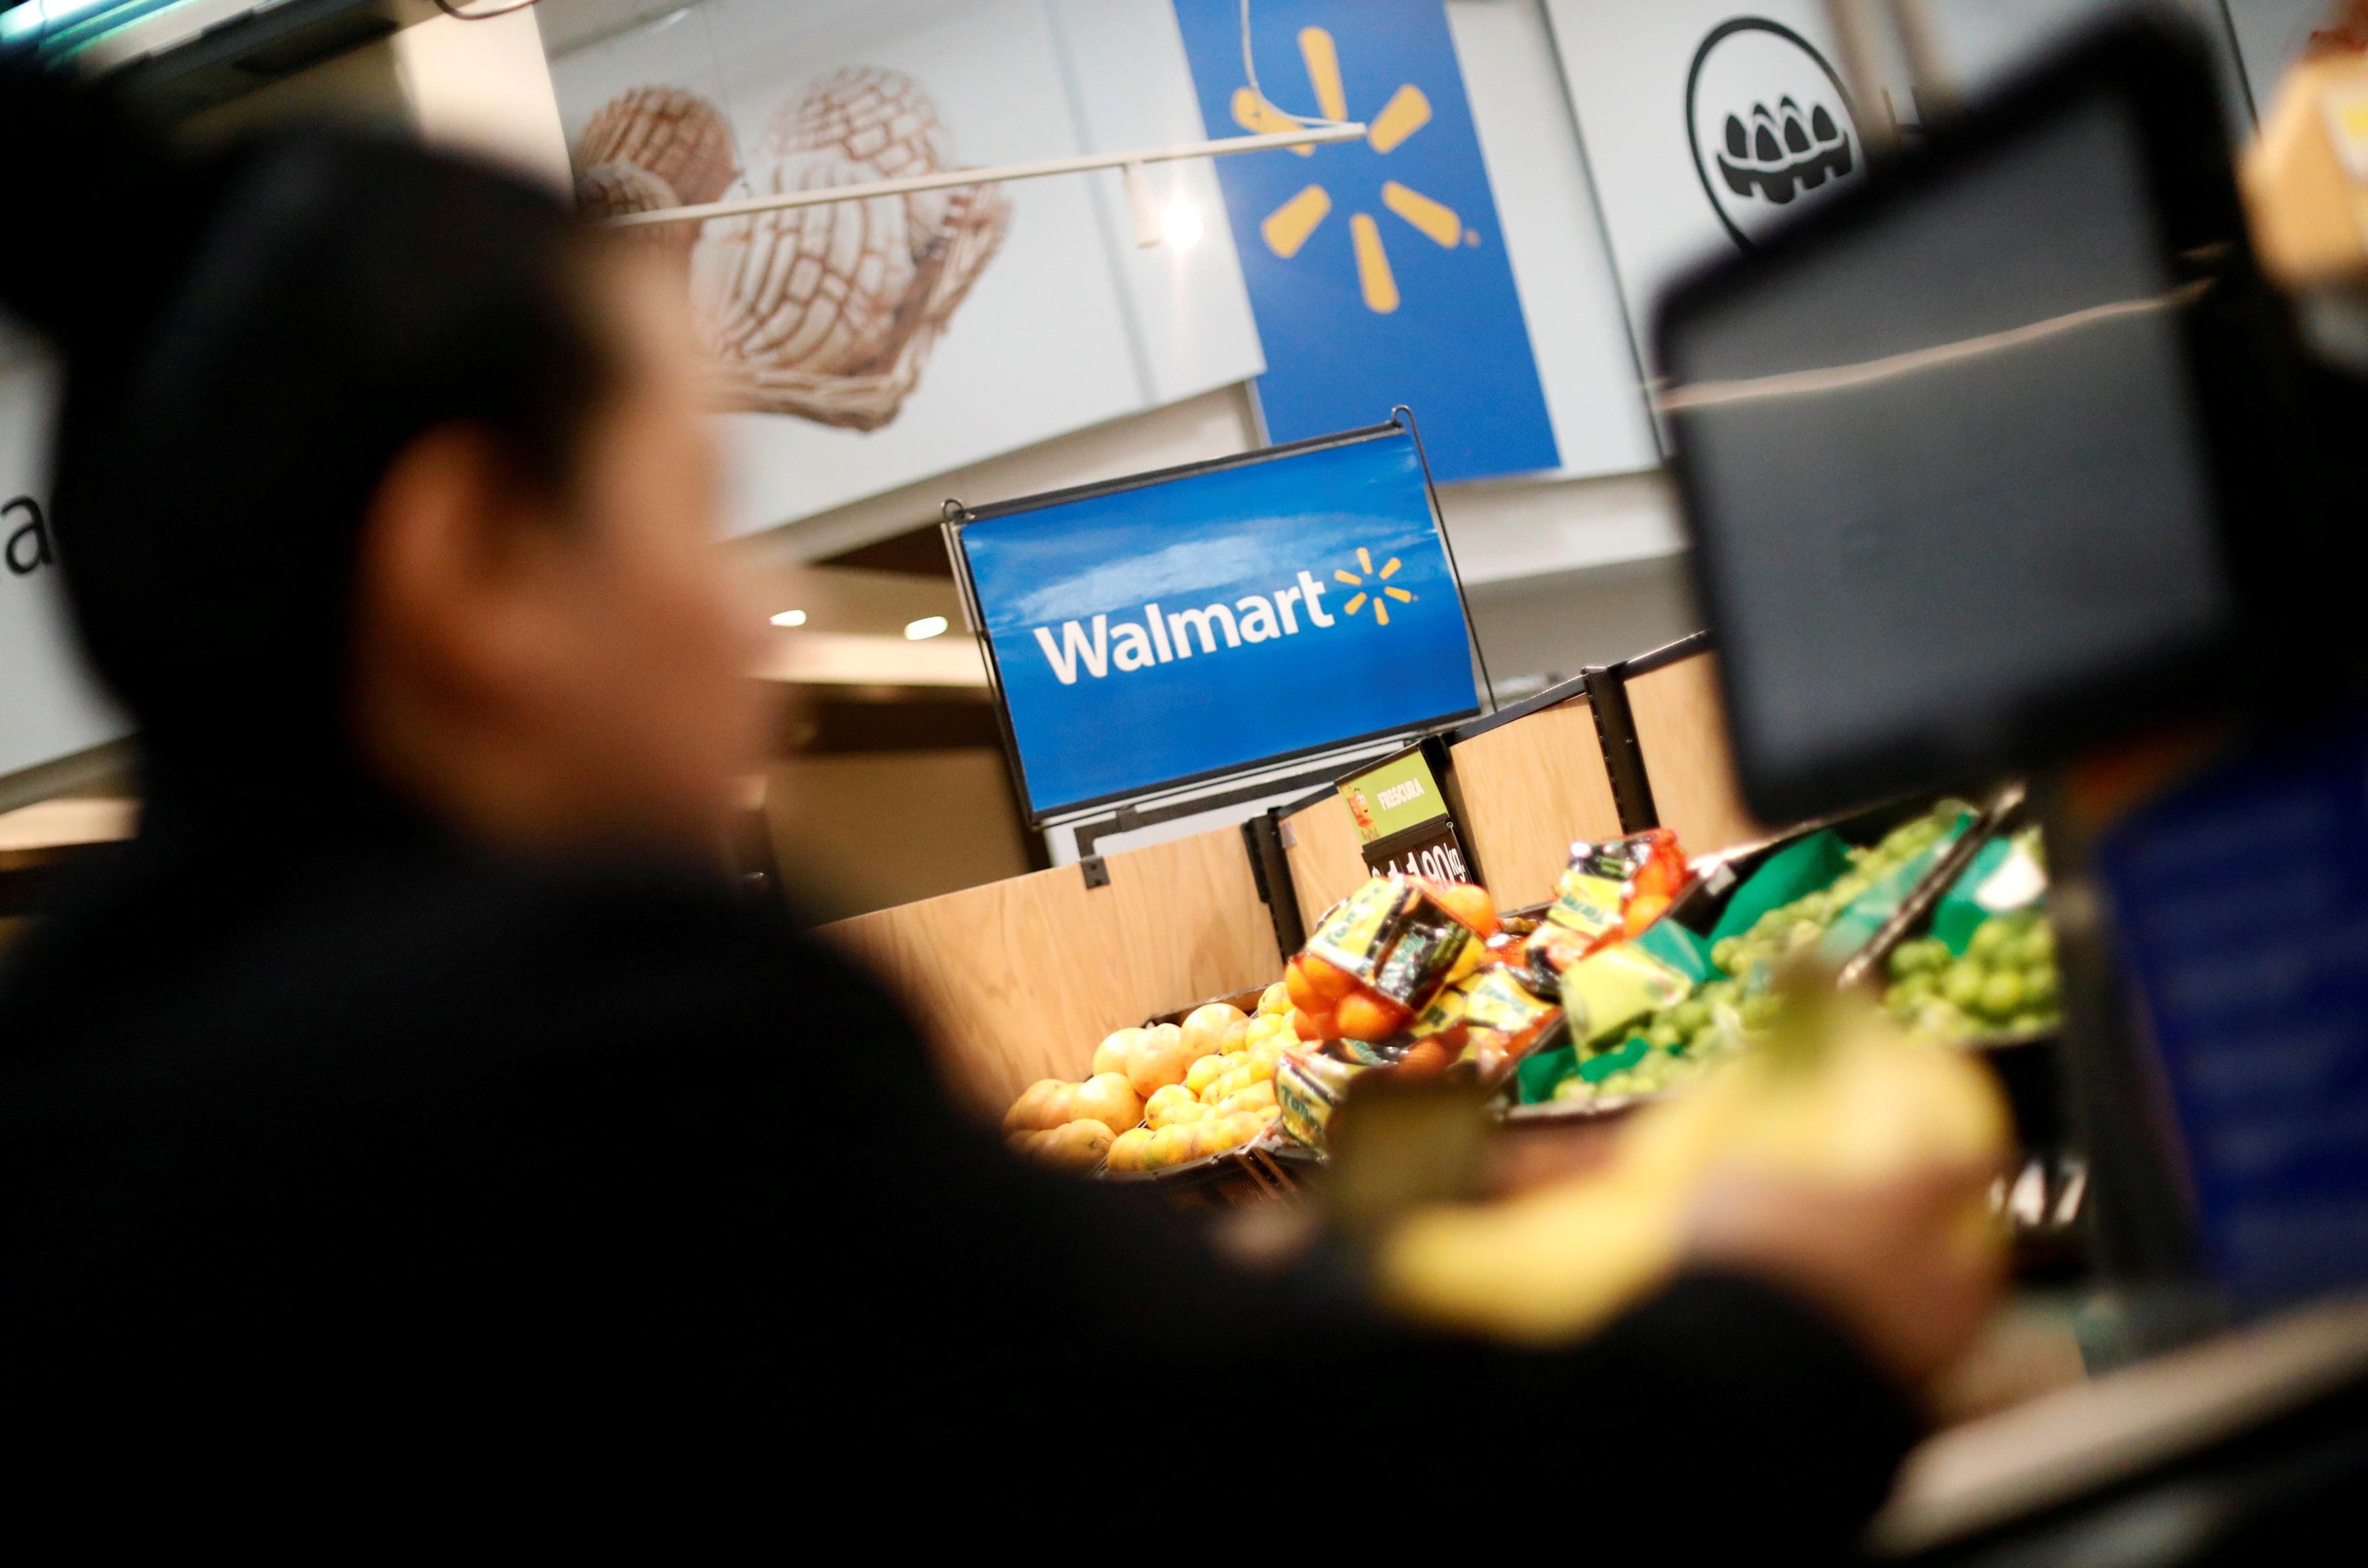 A customer shops inside a Walmart store in Mexico City, Mexico March 28, 2019. REUTERS/Edgard Garrido/File Photo